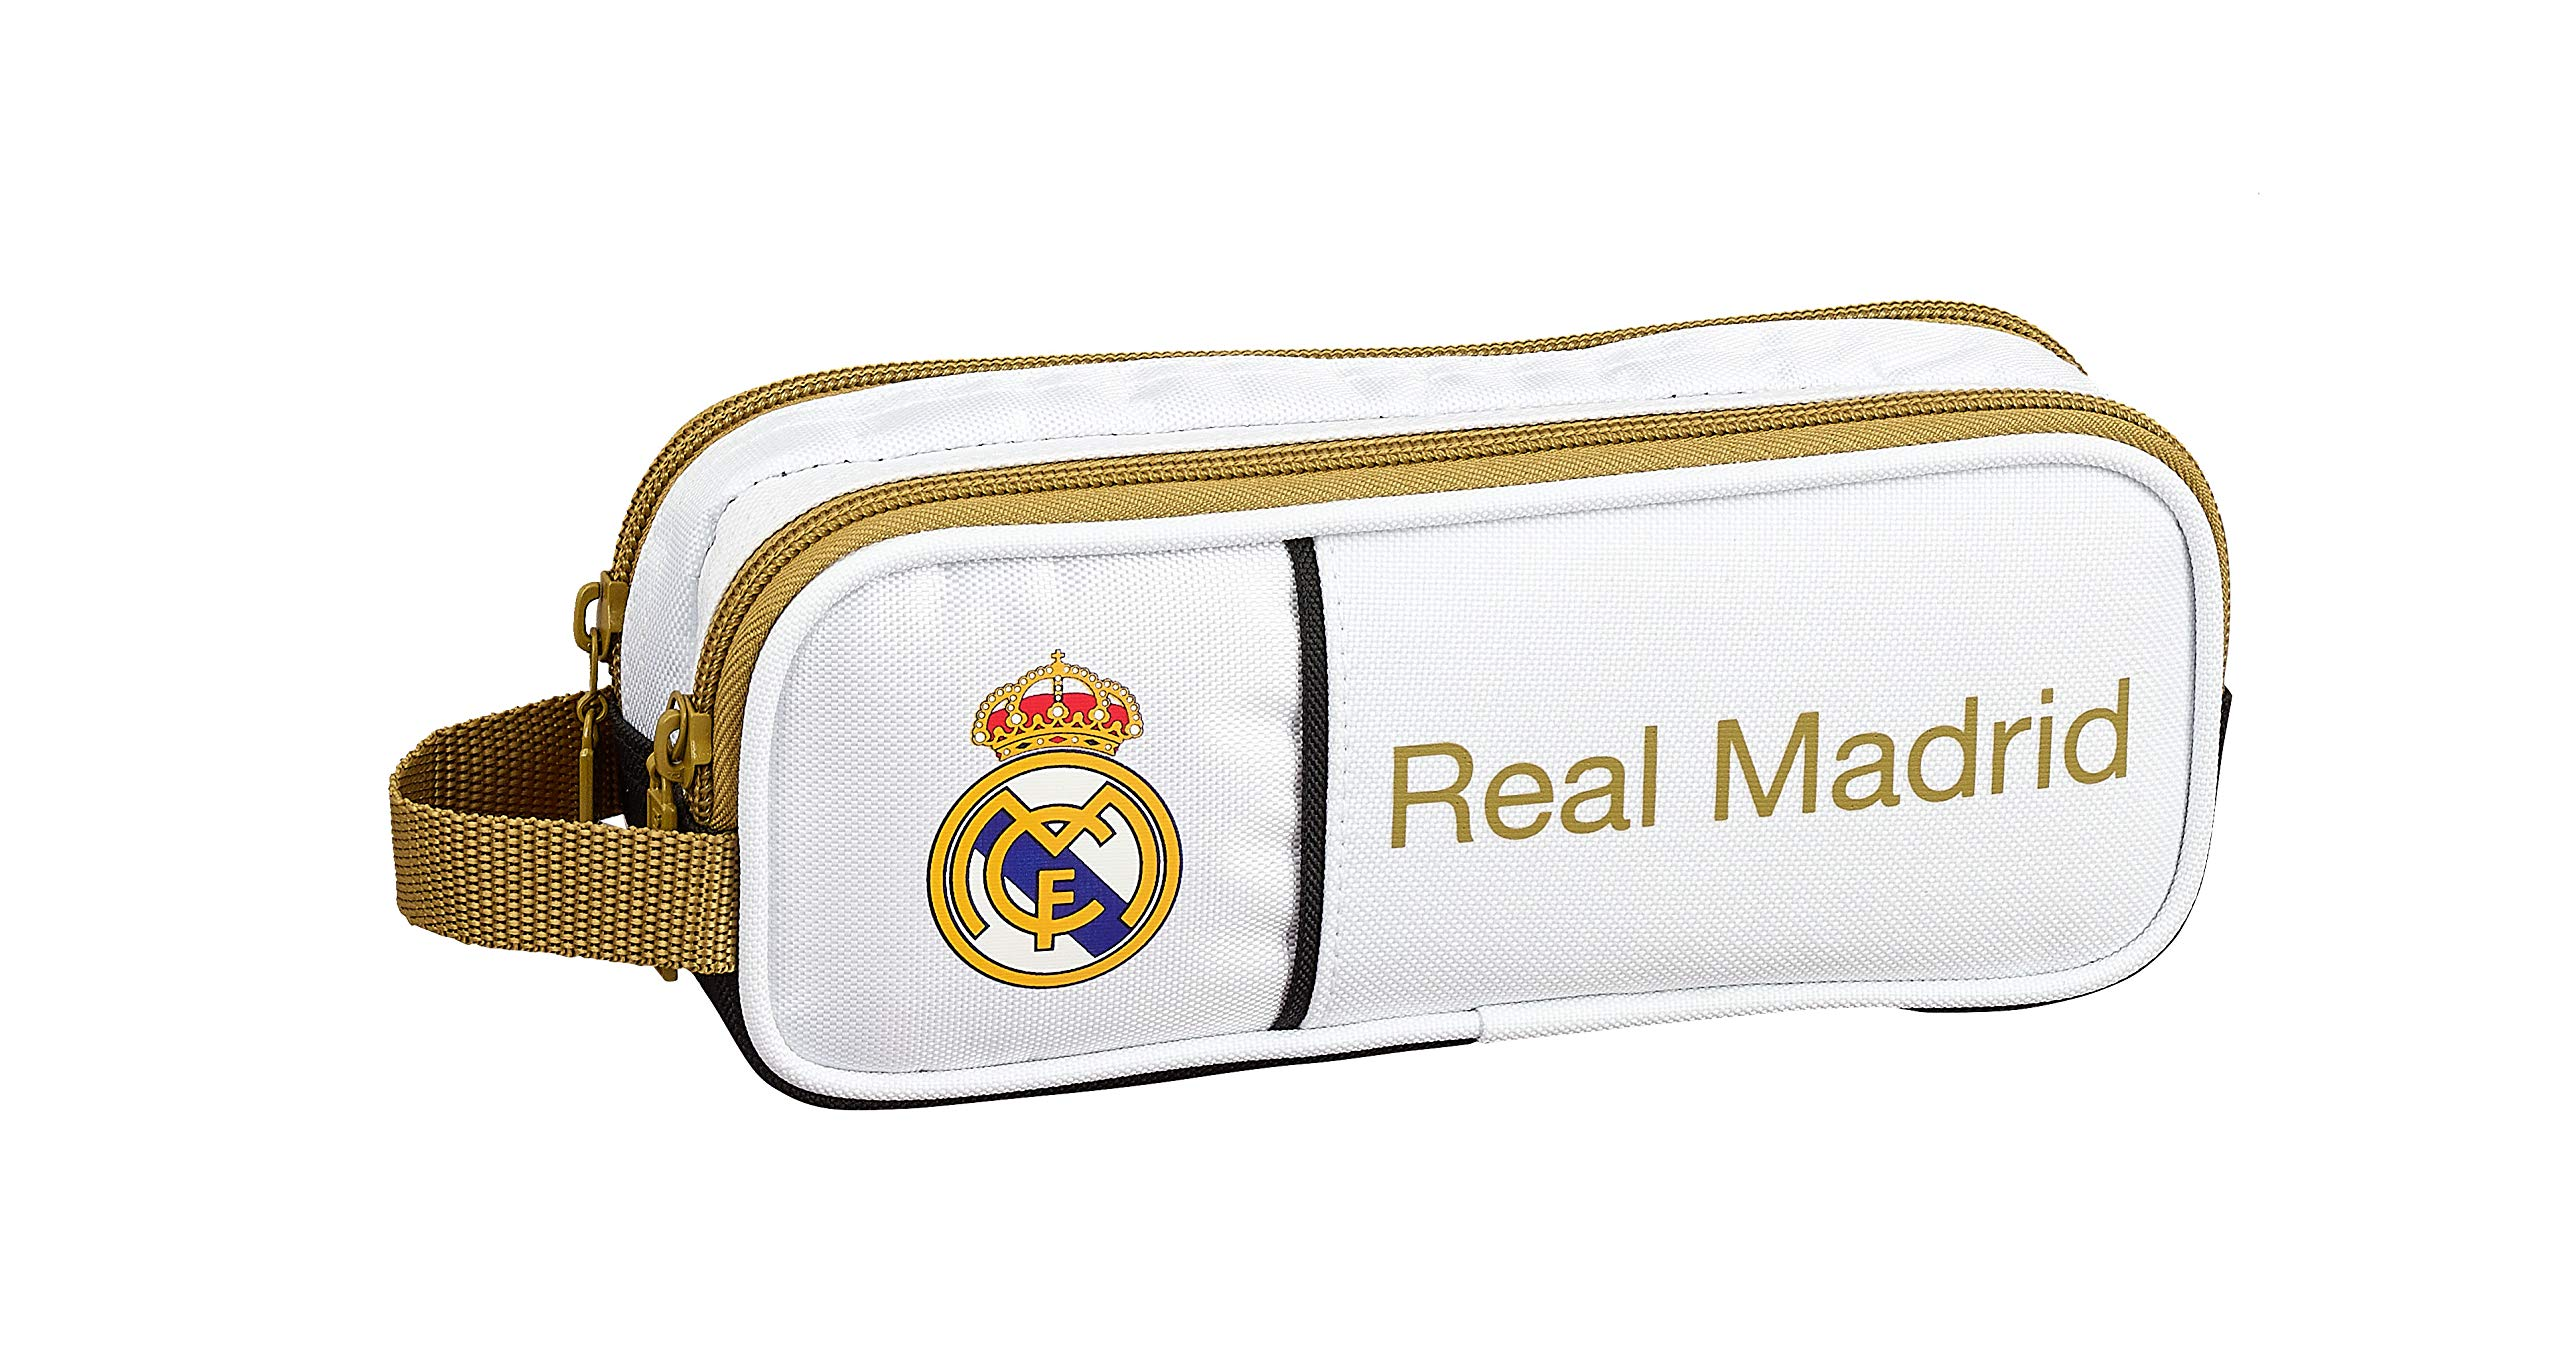 Real Madrid CF 811954513, Real Madrid 19/20 Portatodo Doble para Niños, Varios, 21x8x6cm